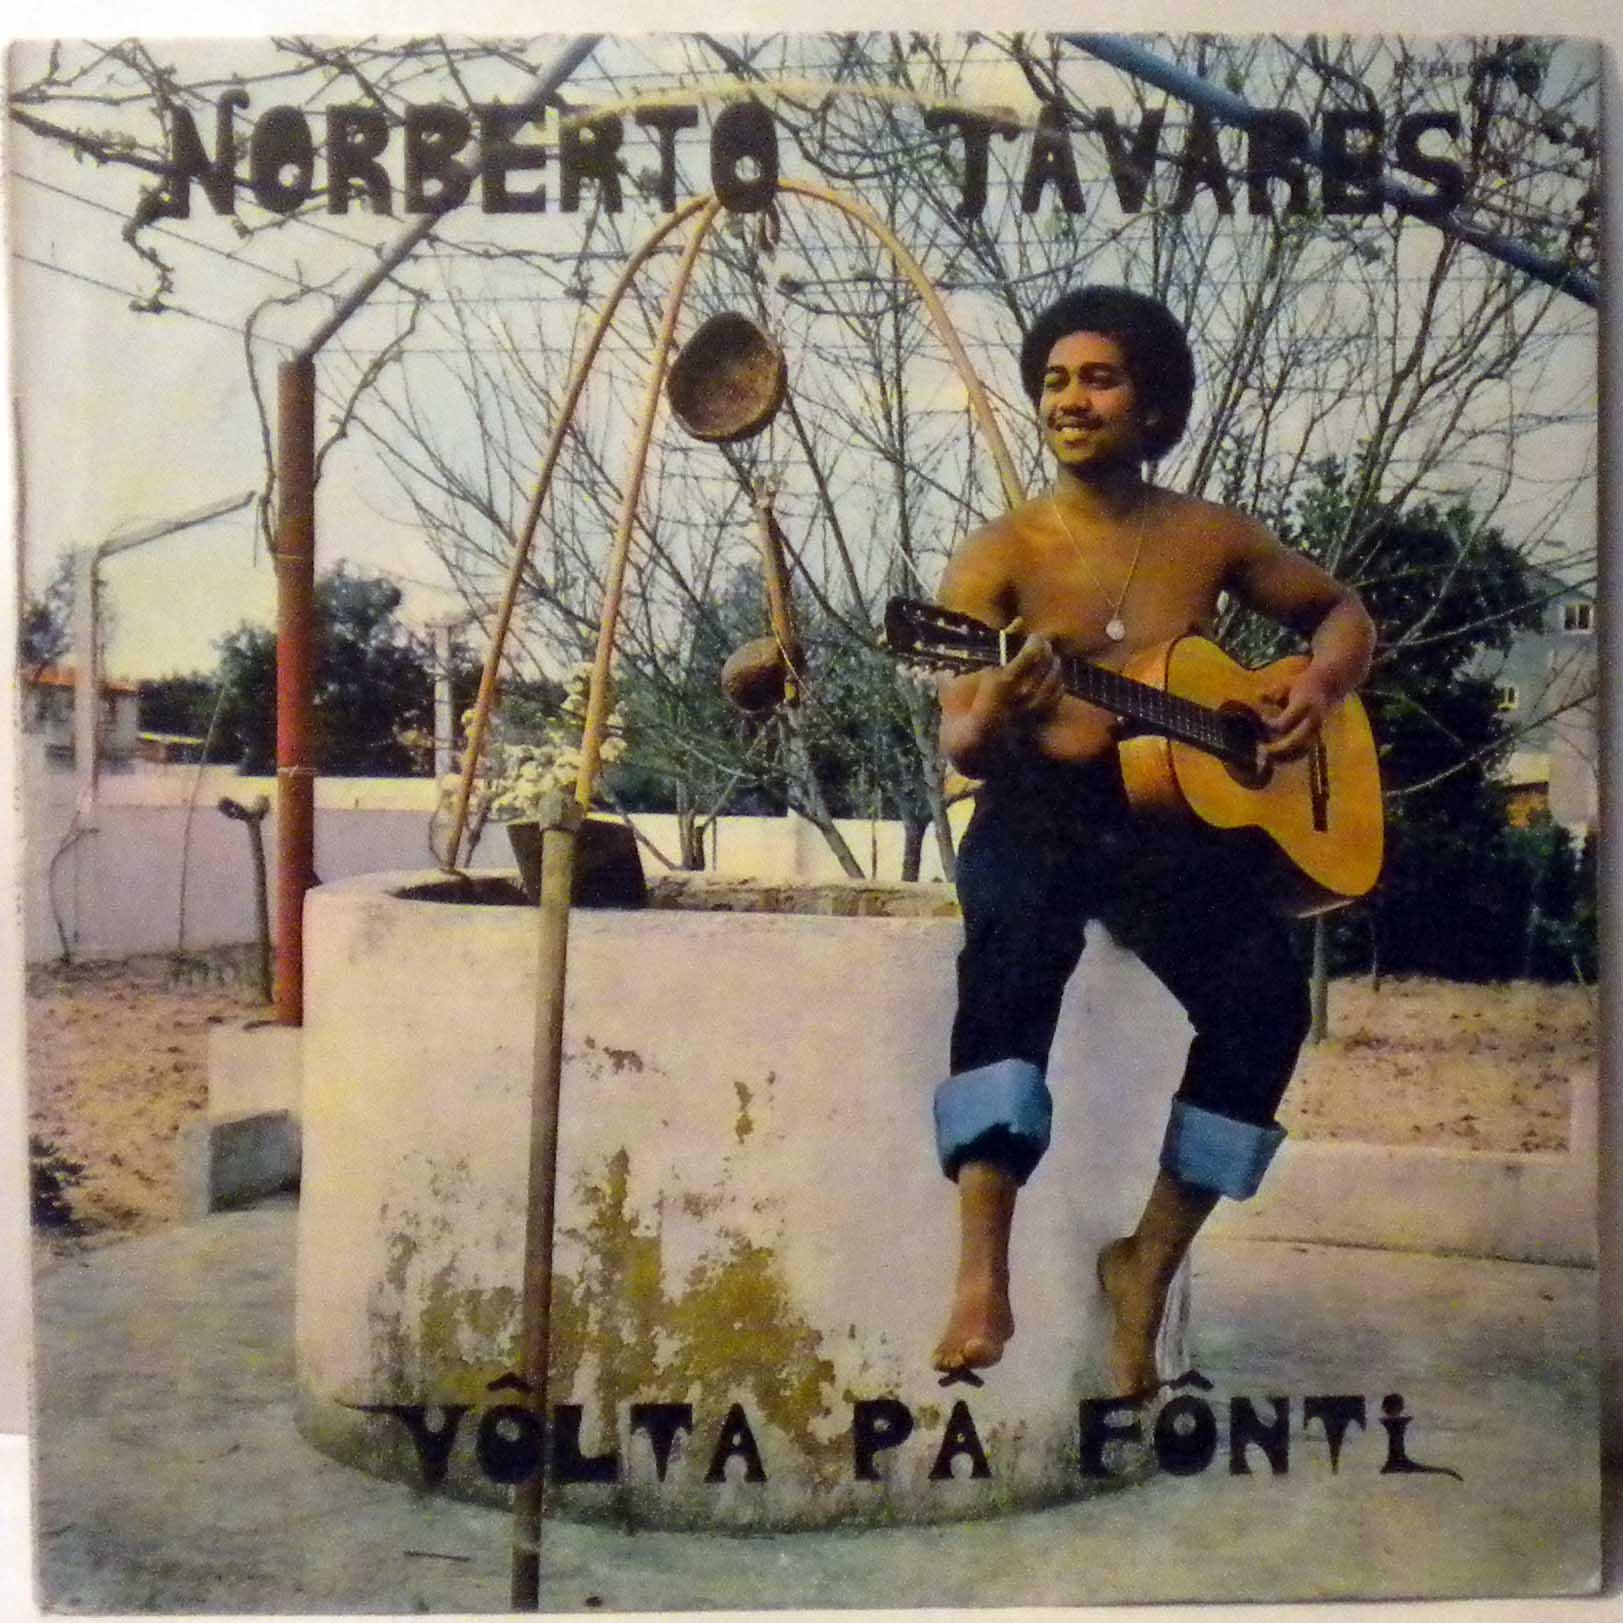 NORBERTO TAVARES - Volta pa fonti - 33T